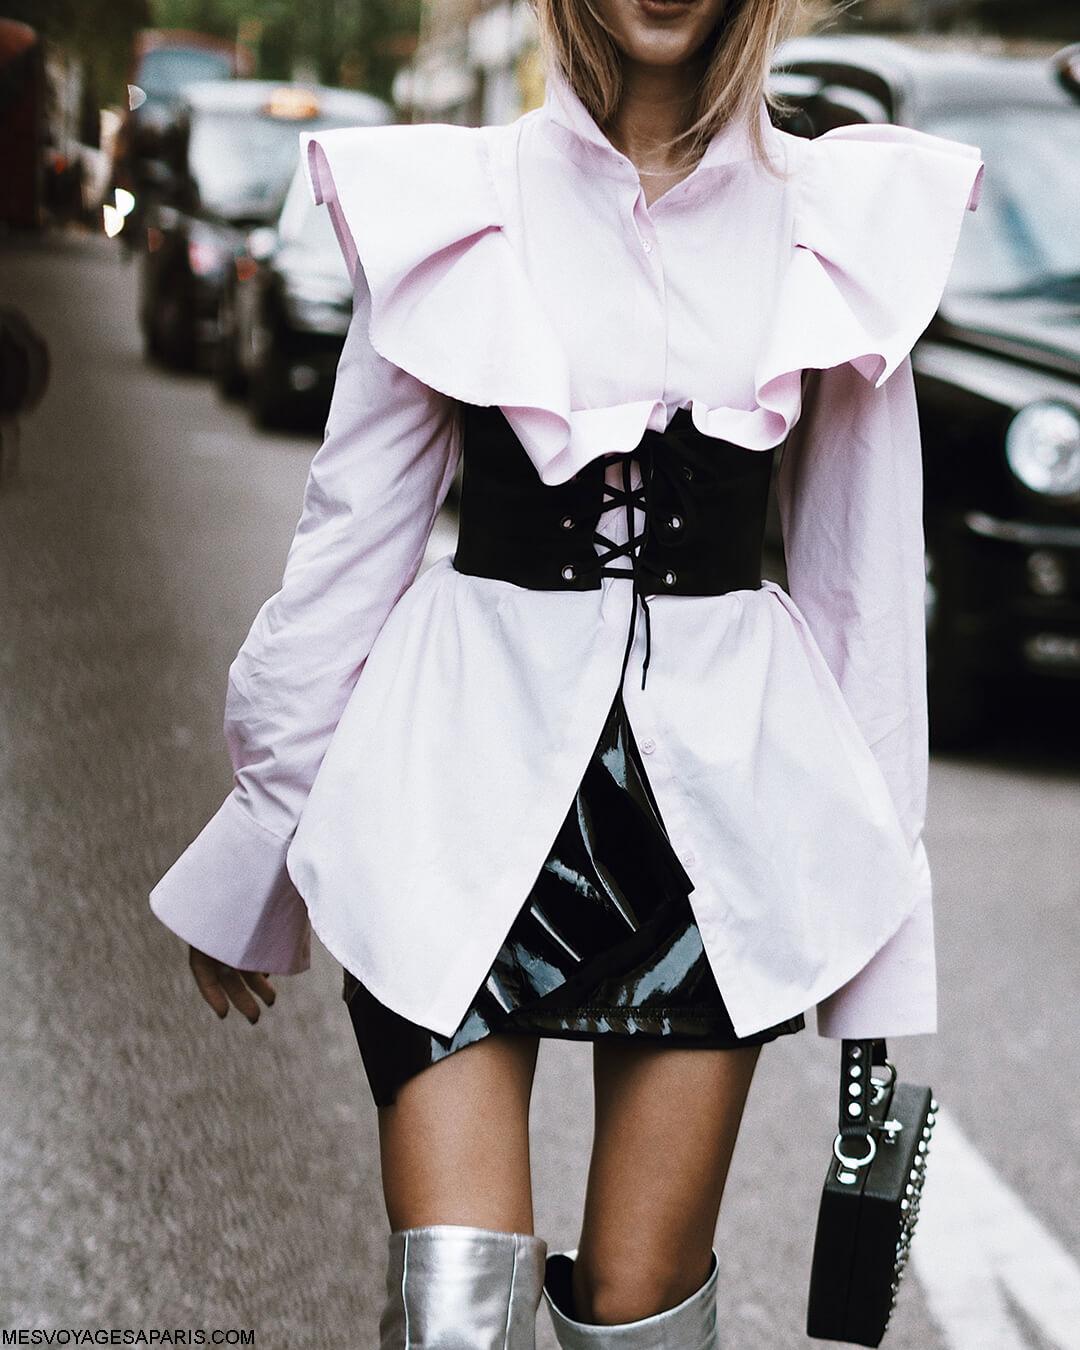 LFW-Street-Style-September-2017-london-fashion-week-rosa-crespo